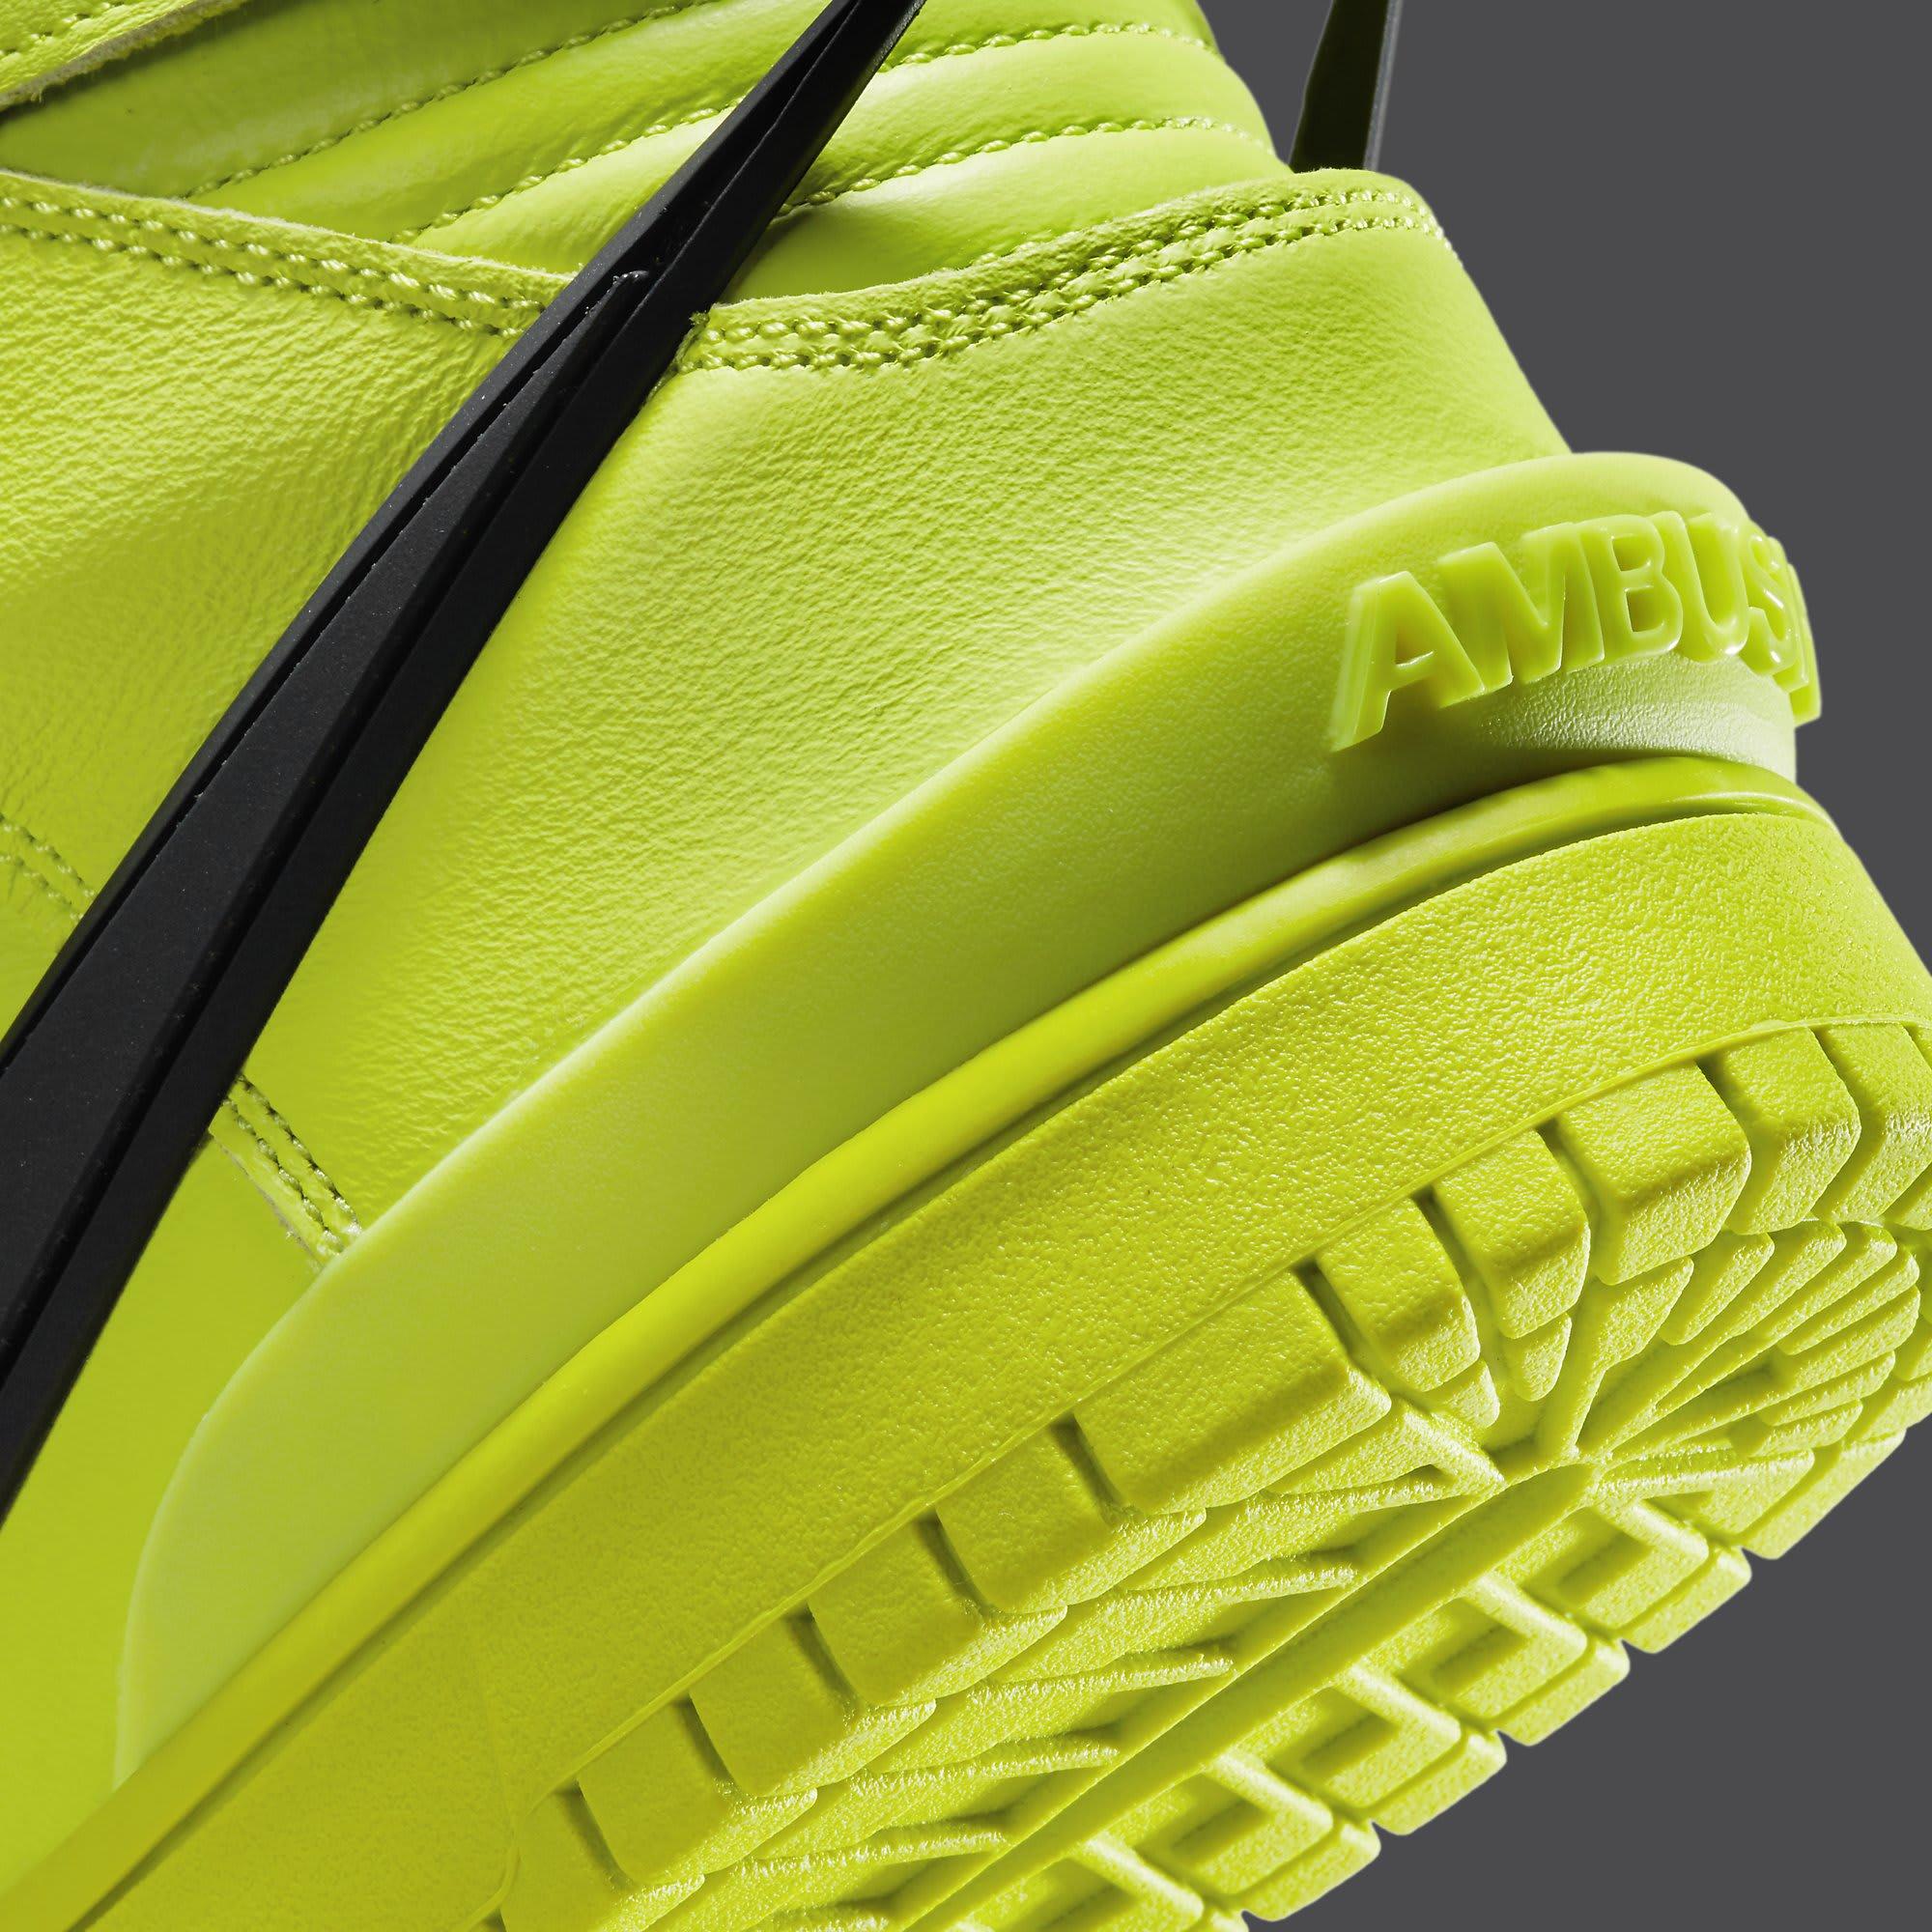 Ambush x Nike Dunk High Atomic Green Release Date CU7544-300 Heel Detail